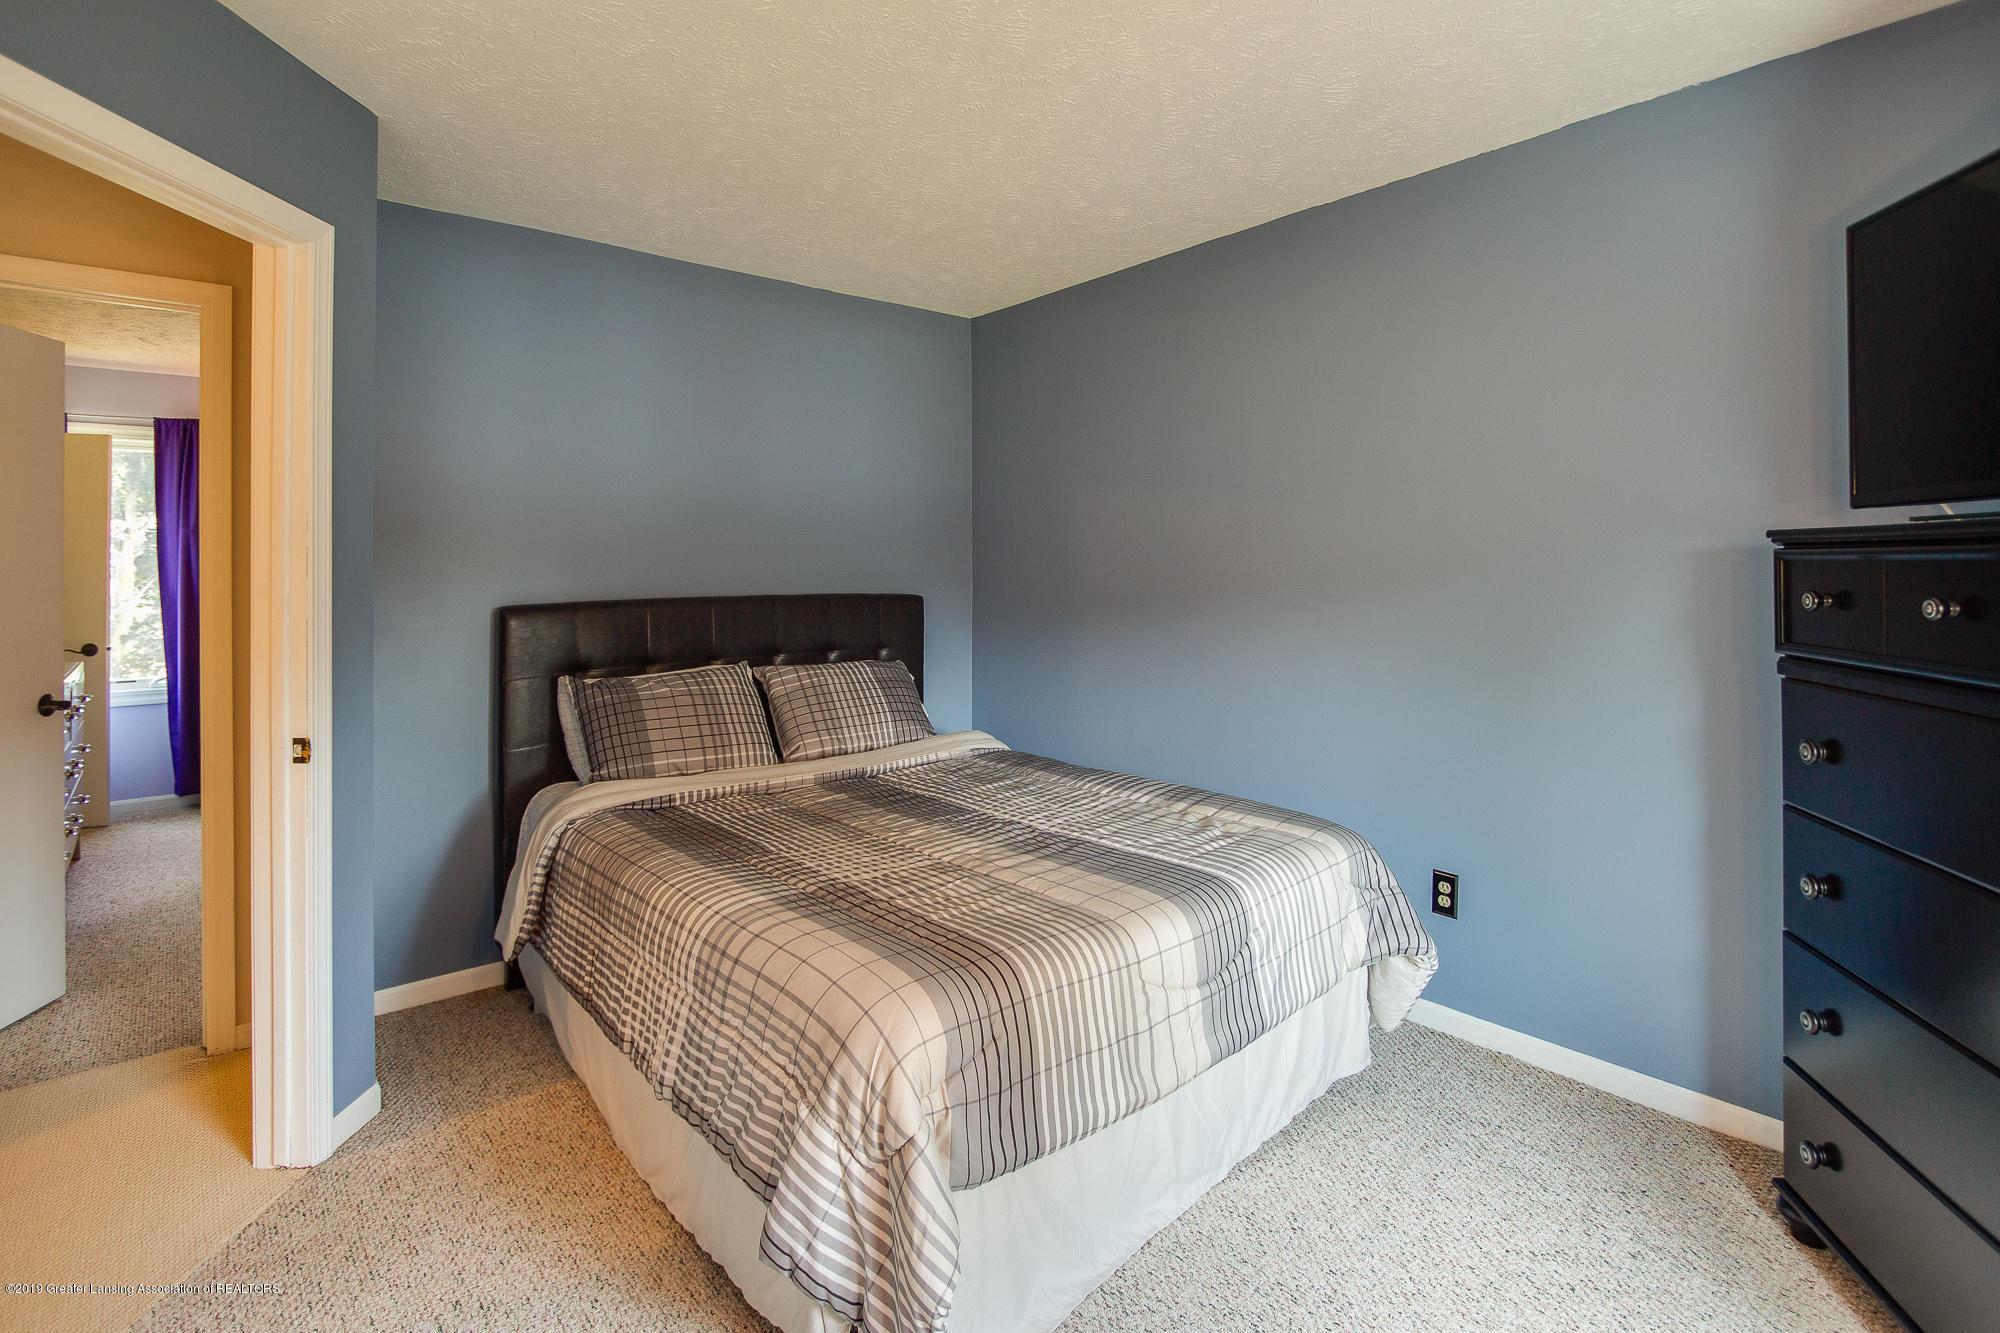 10191 S Bay Dr - Bedroom 2 - 19